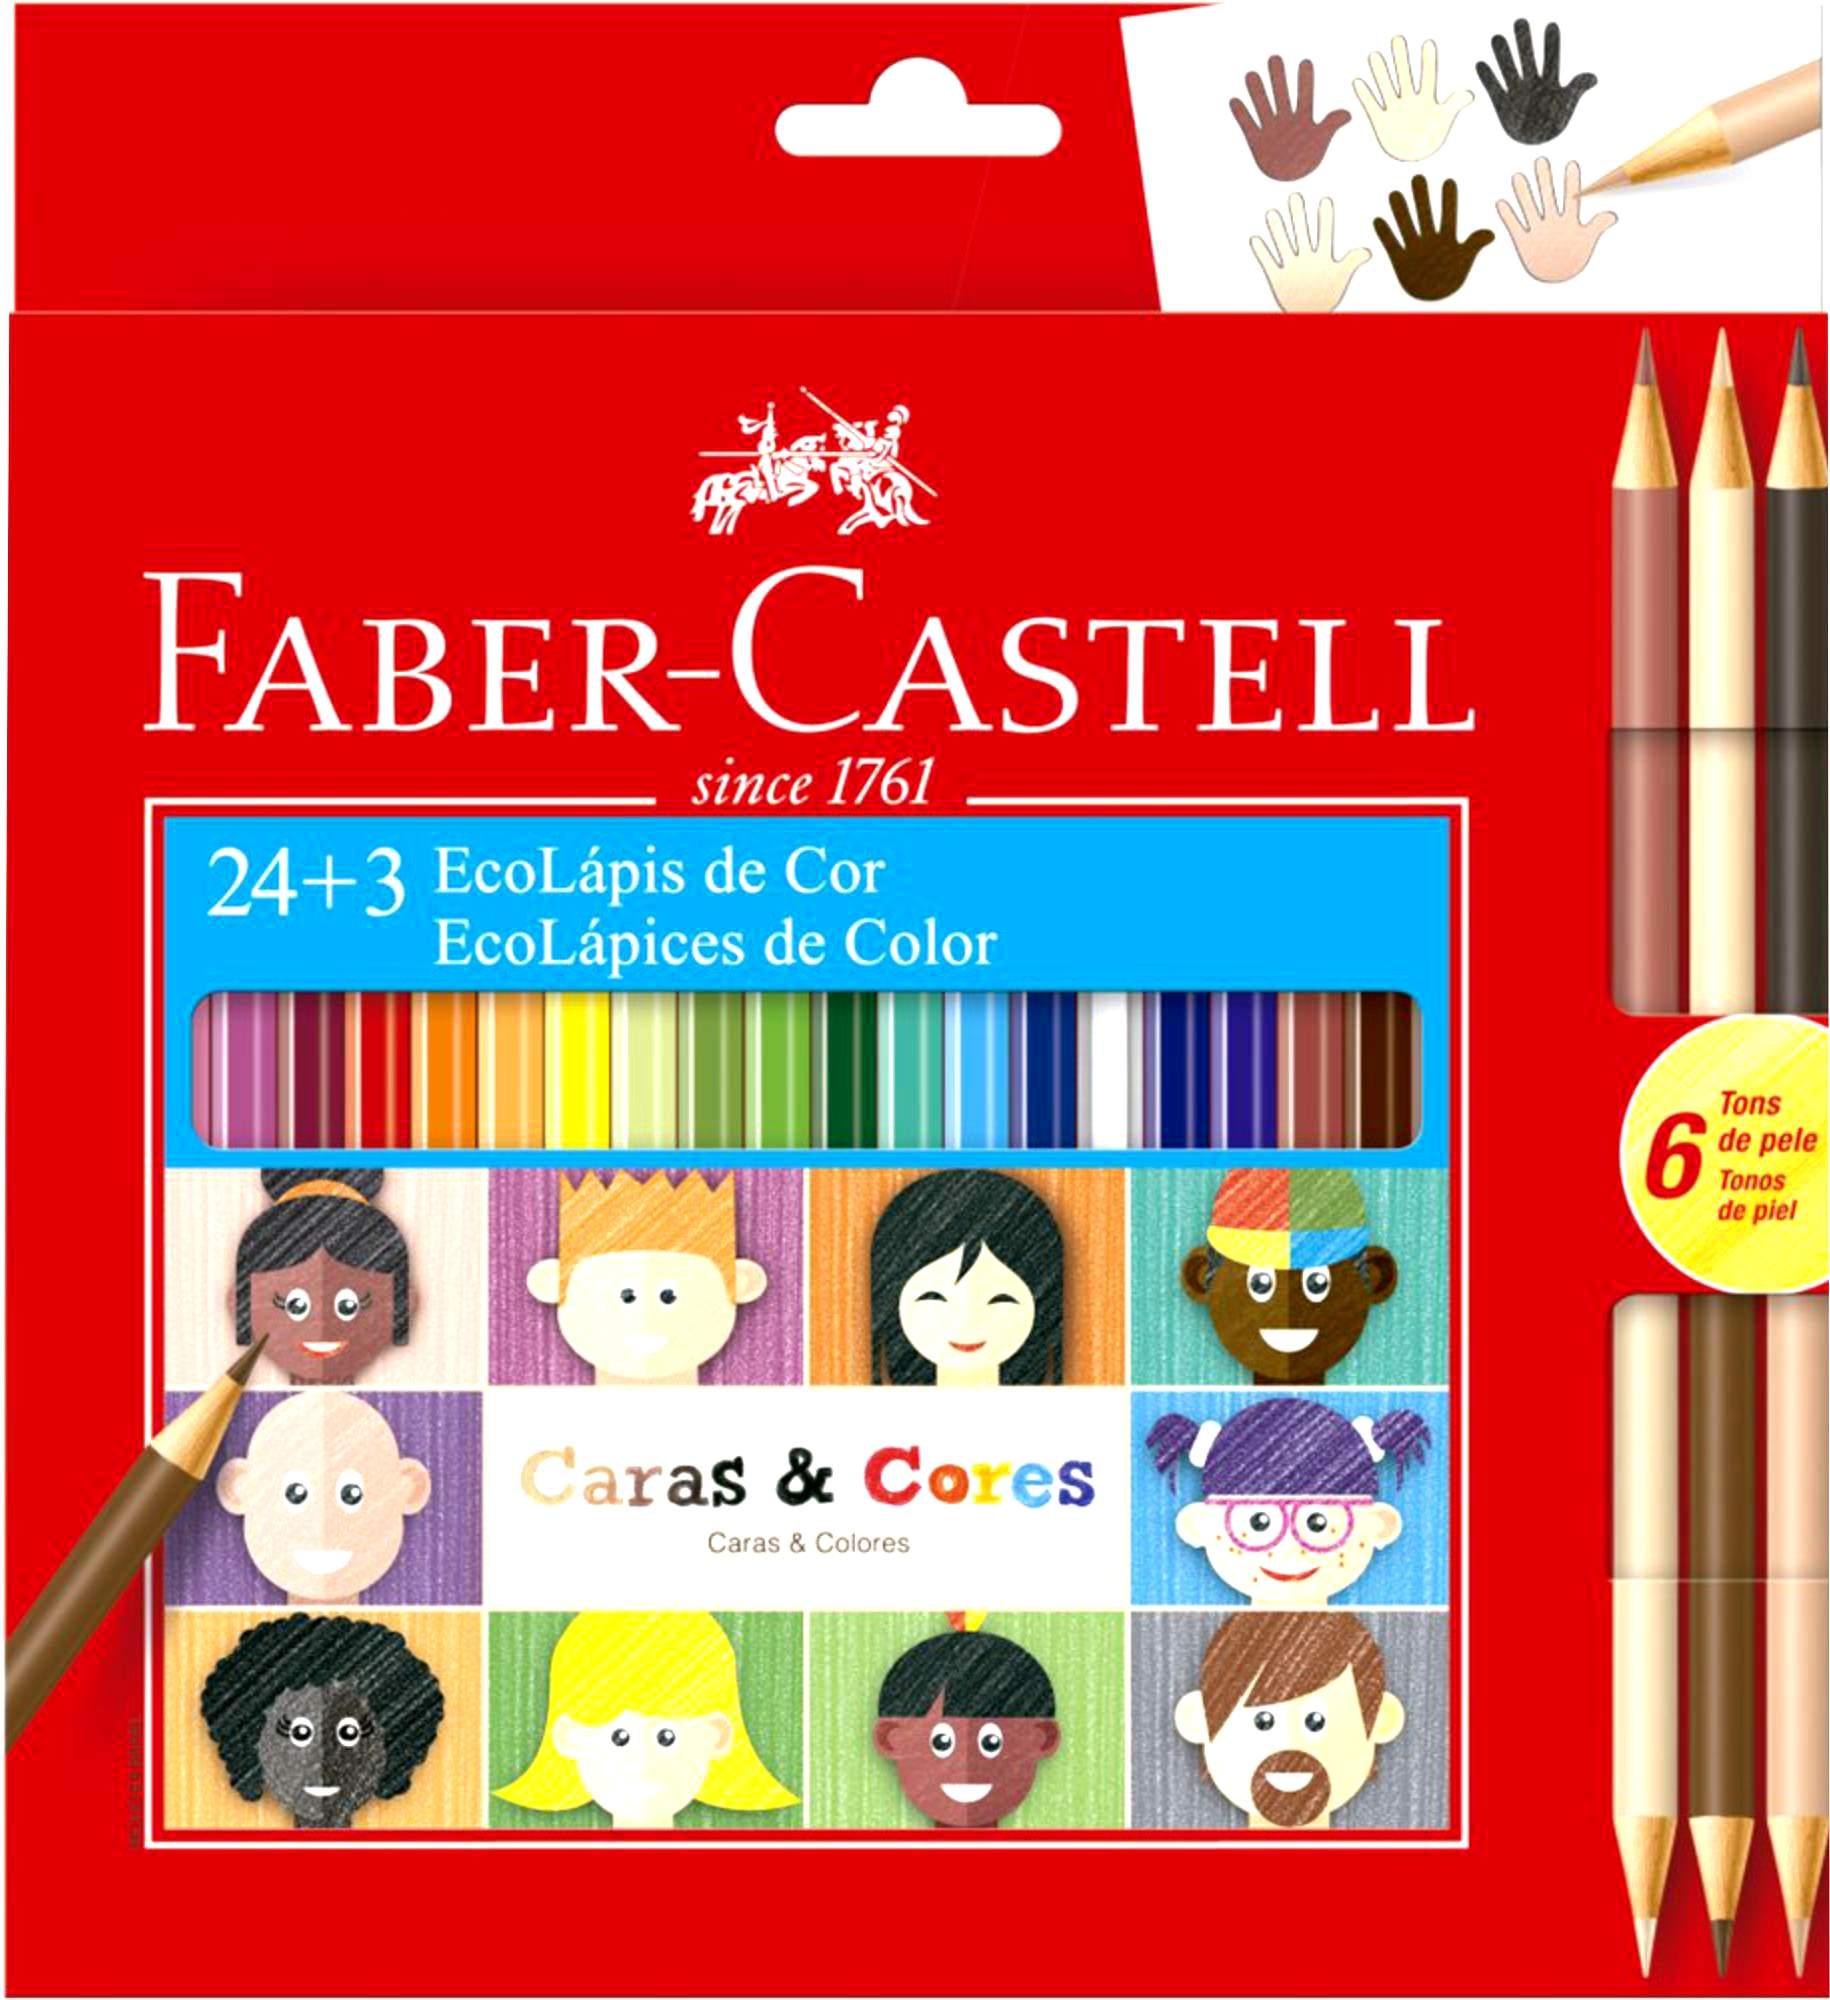 Lápis De Cor Faber Castell Caras e Cores 24+3